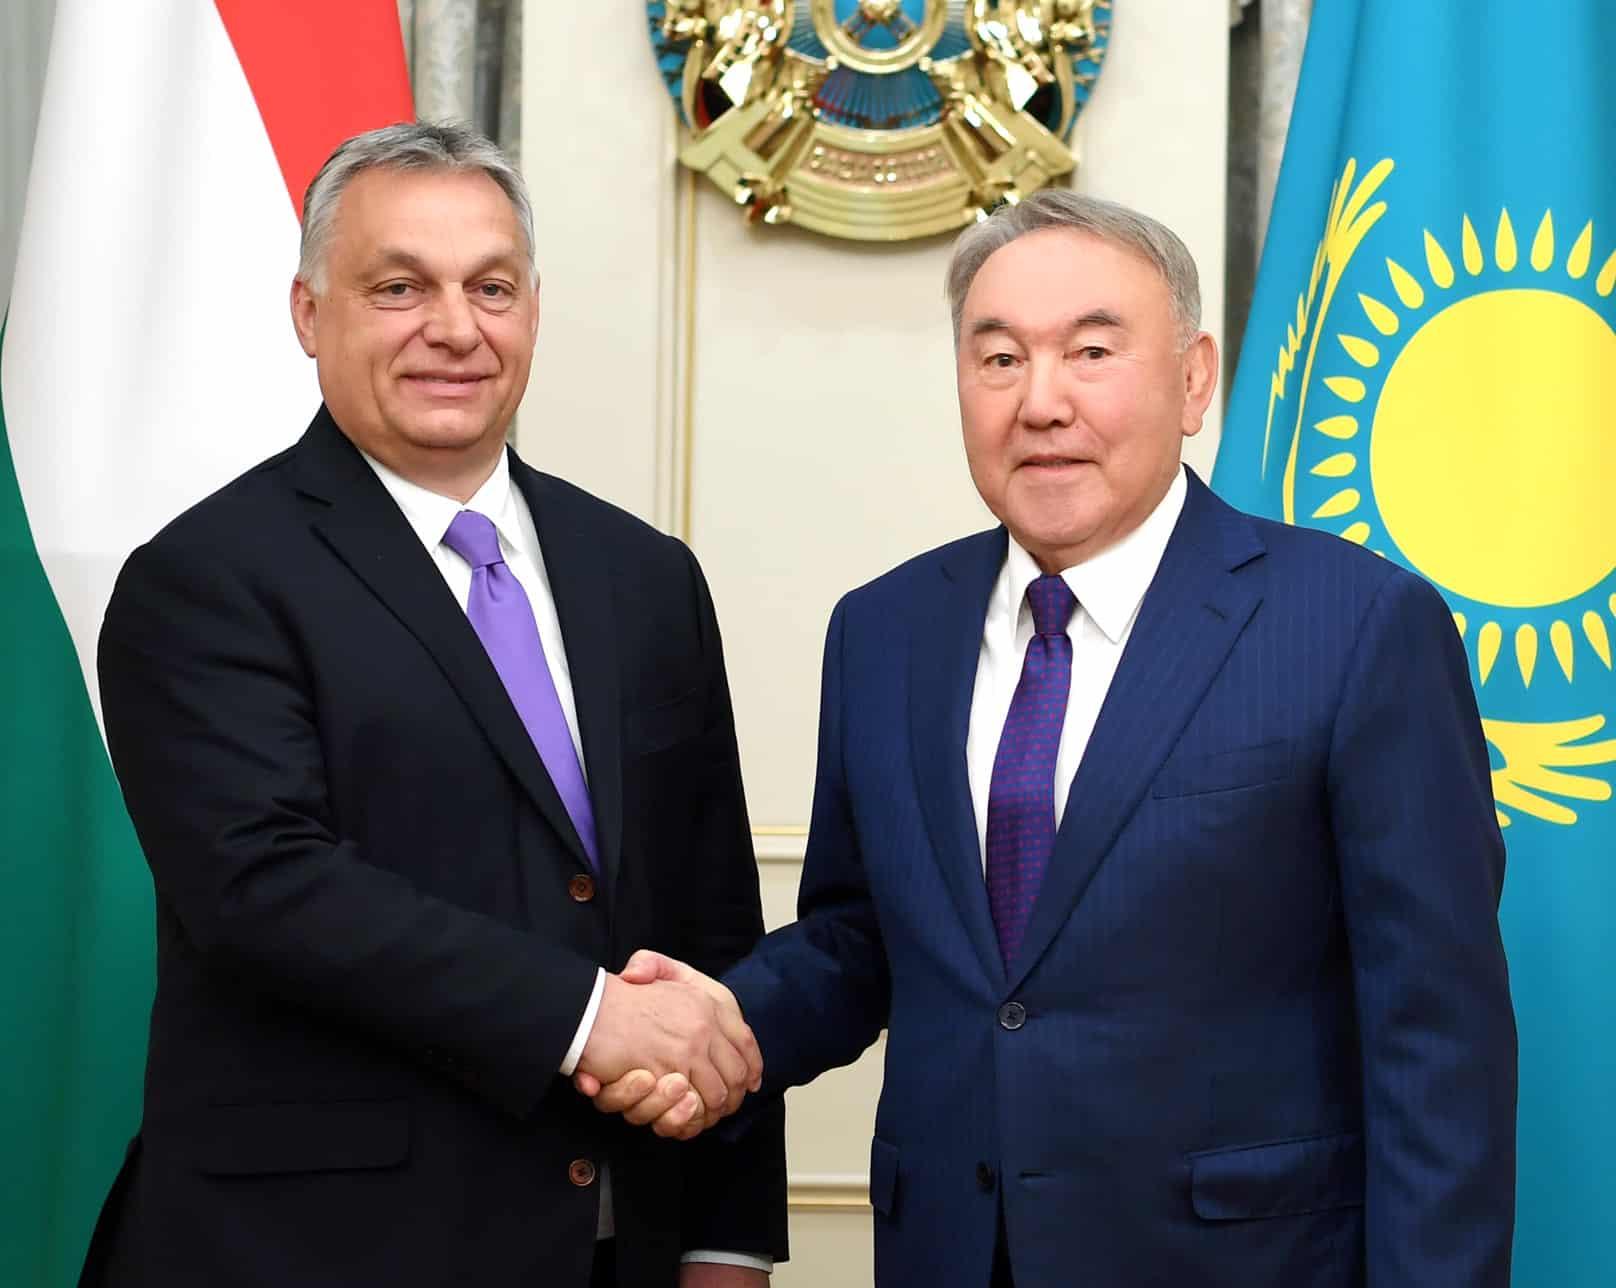 Нұрсұлтан Назарбаев Виктор Орбанмен кездесті